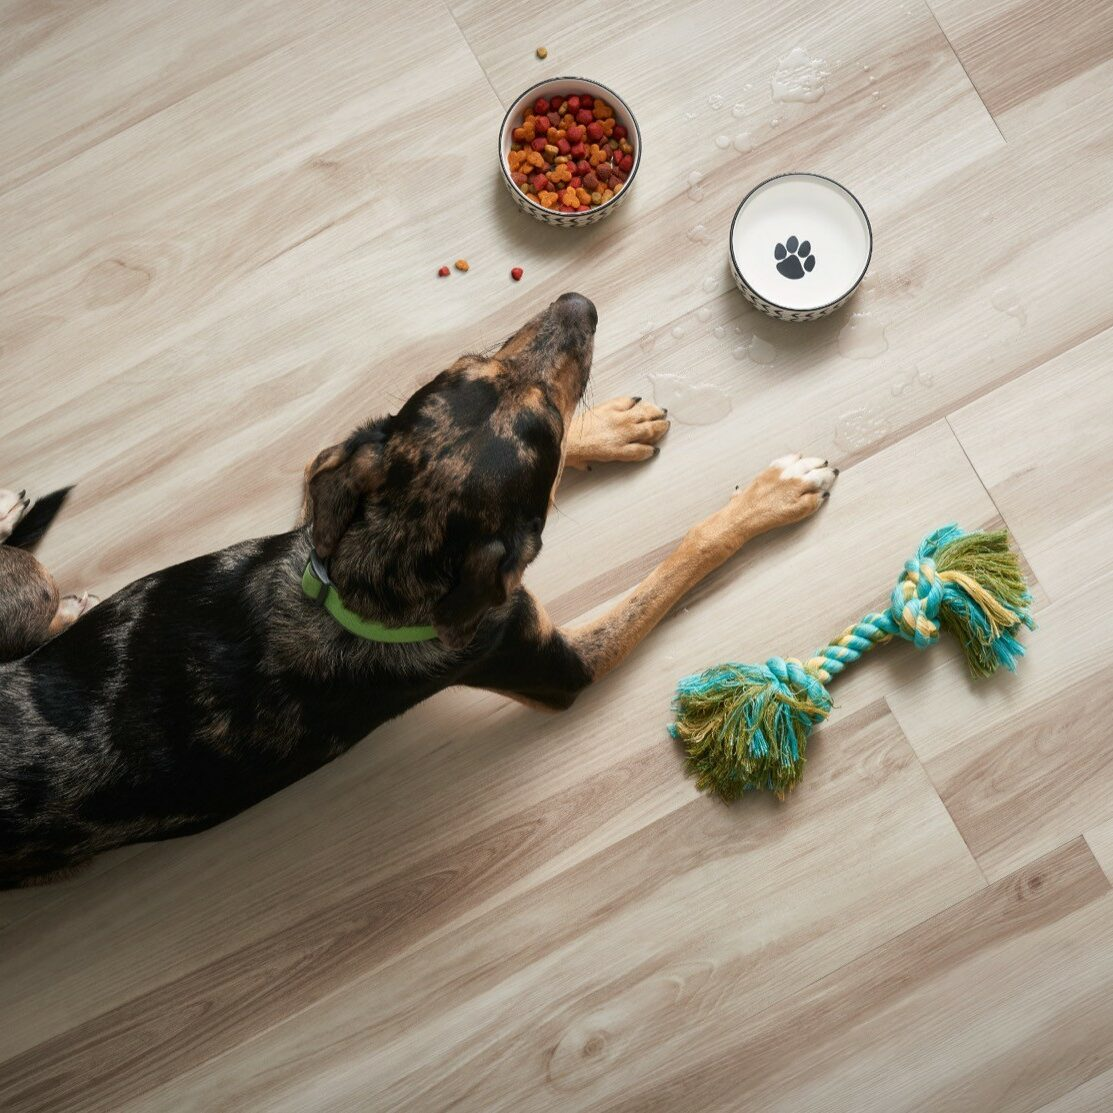 Dog on floor | Flooring 101